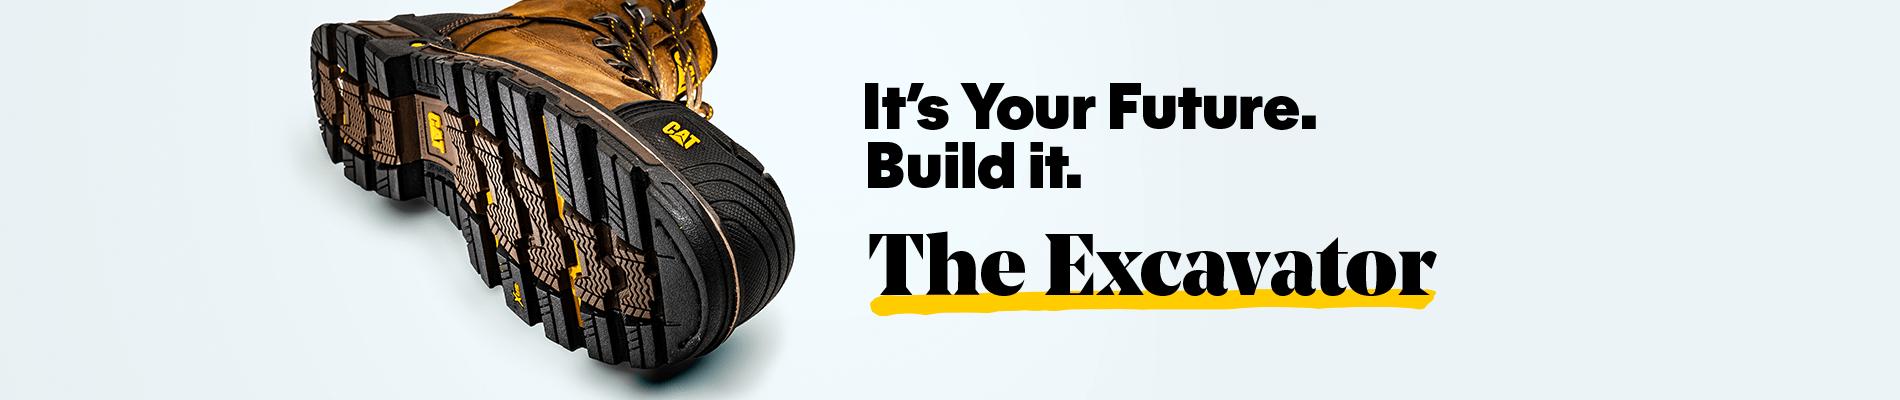 It's Your Future. Build it. The Excavator